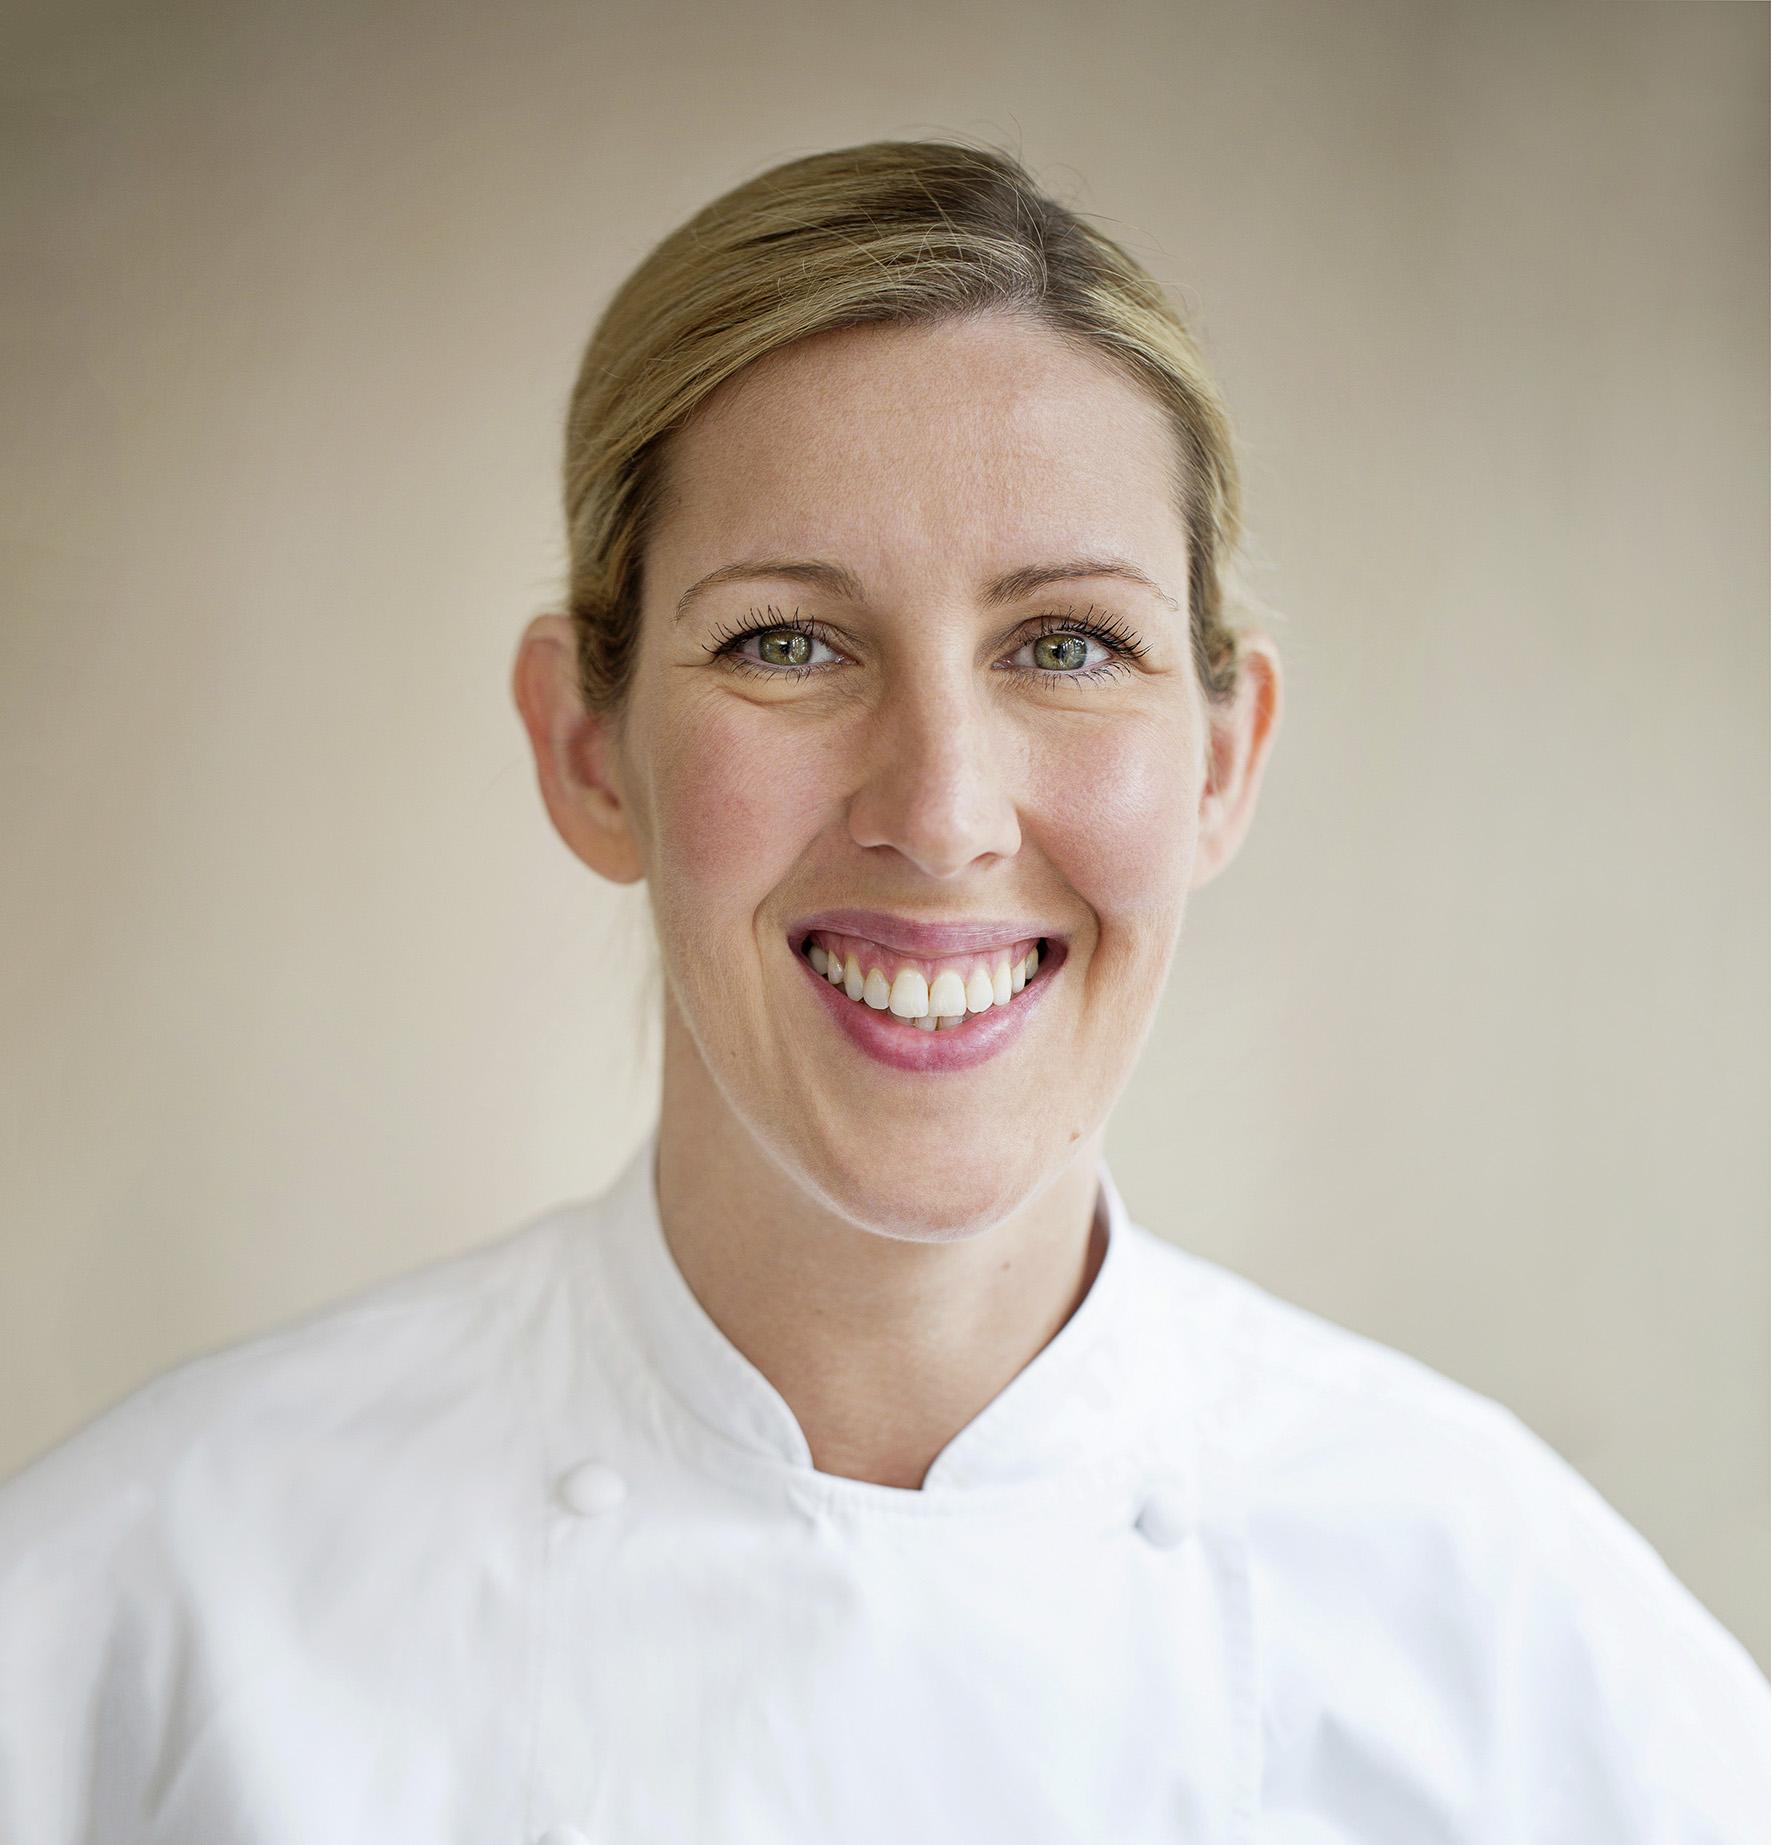 Clare Smyth